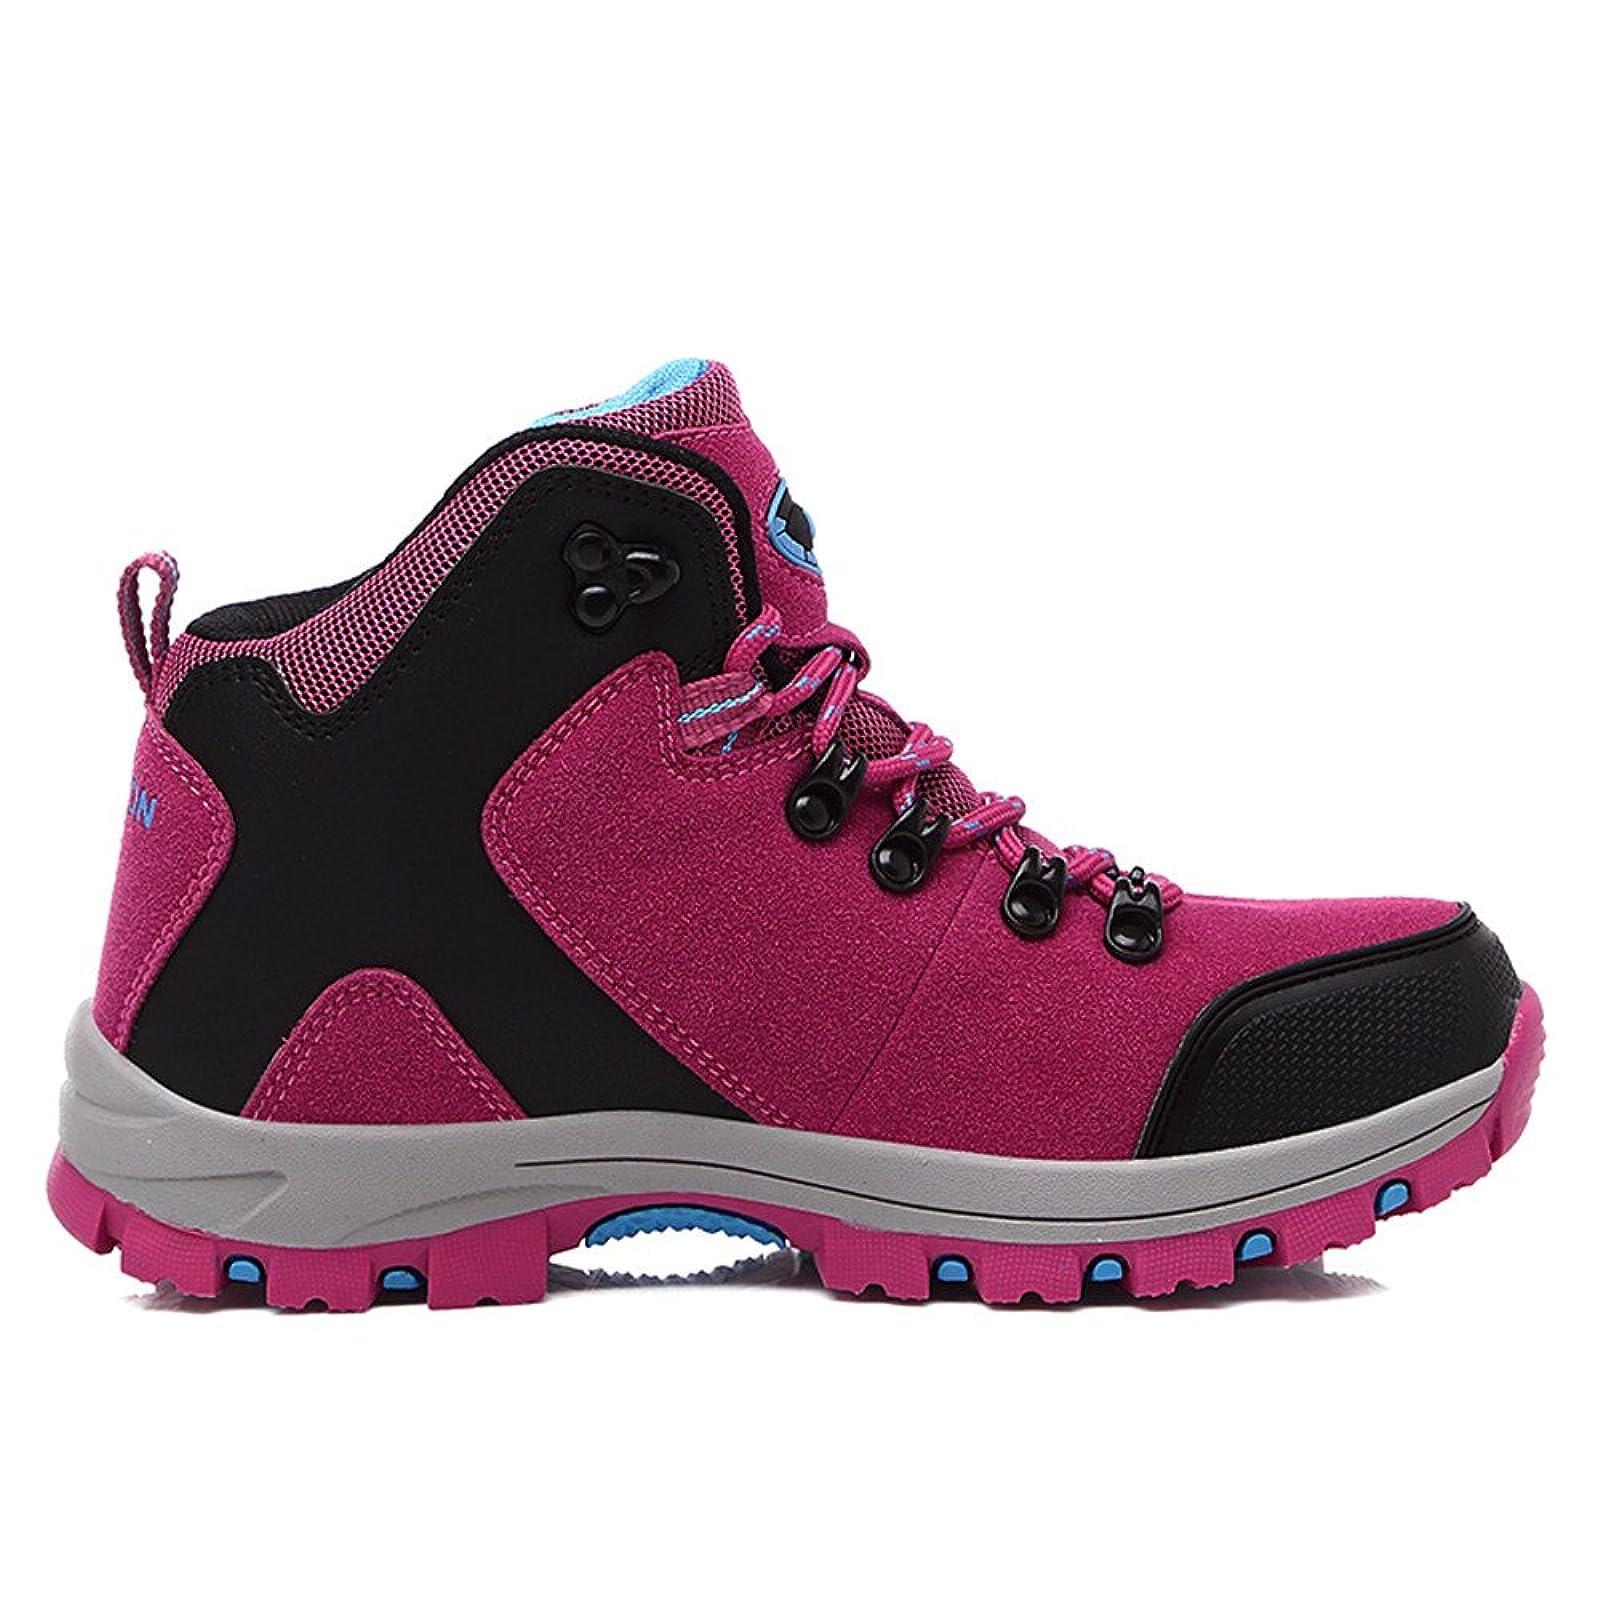 FEOZYZ Womens Hiking Boots Trekking Shoes Anti- QLMXZY's 1008 - 1